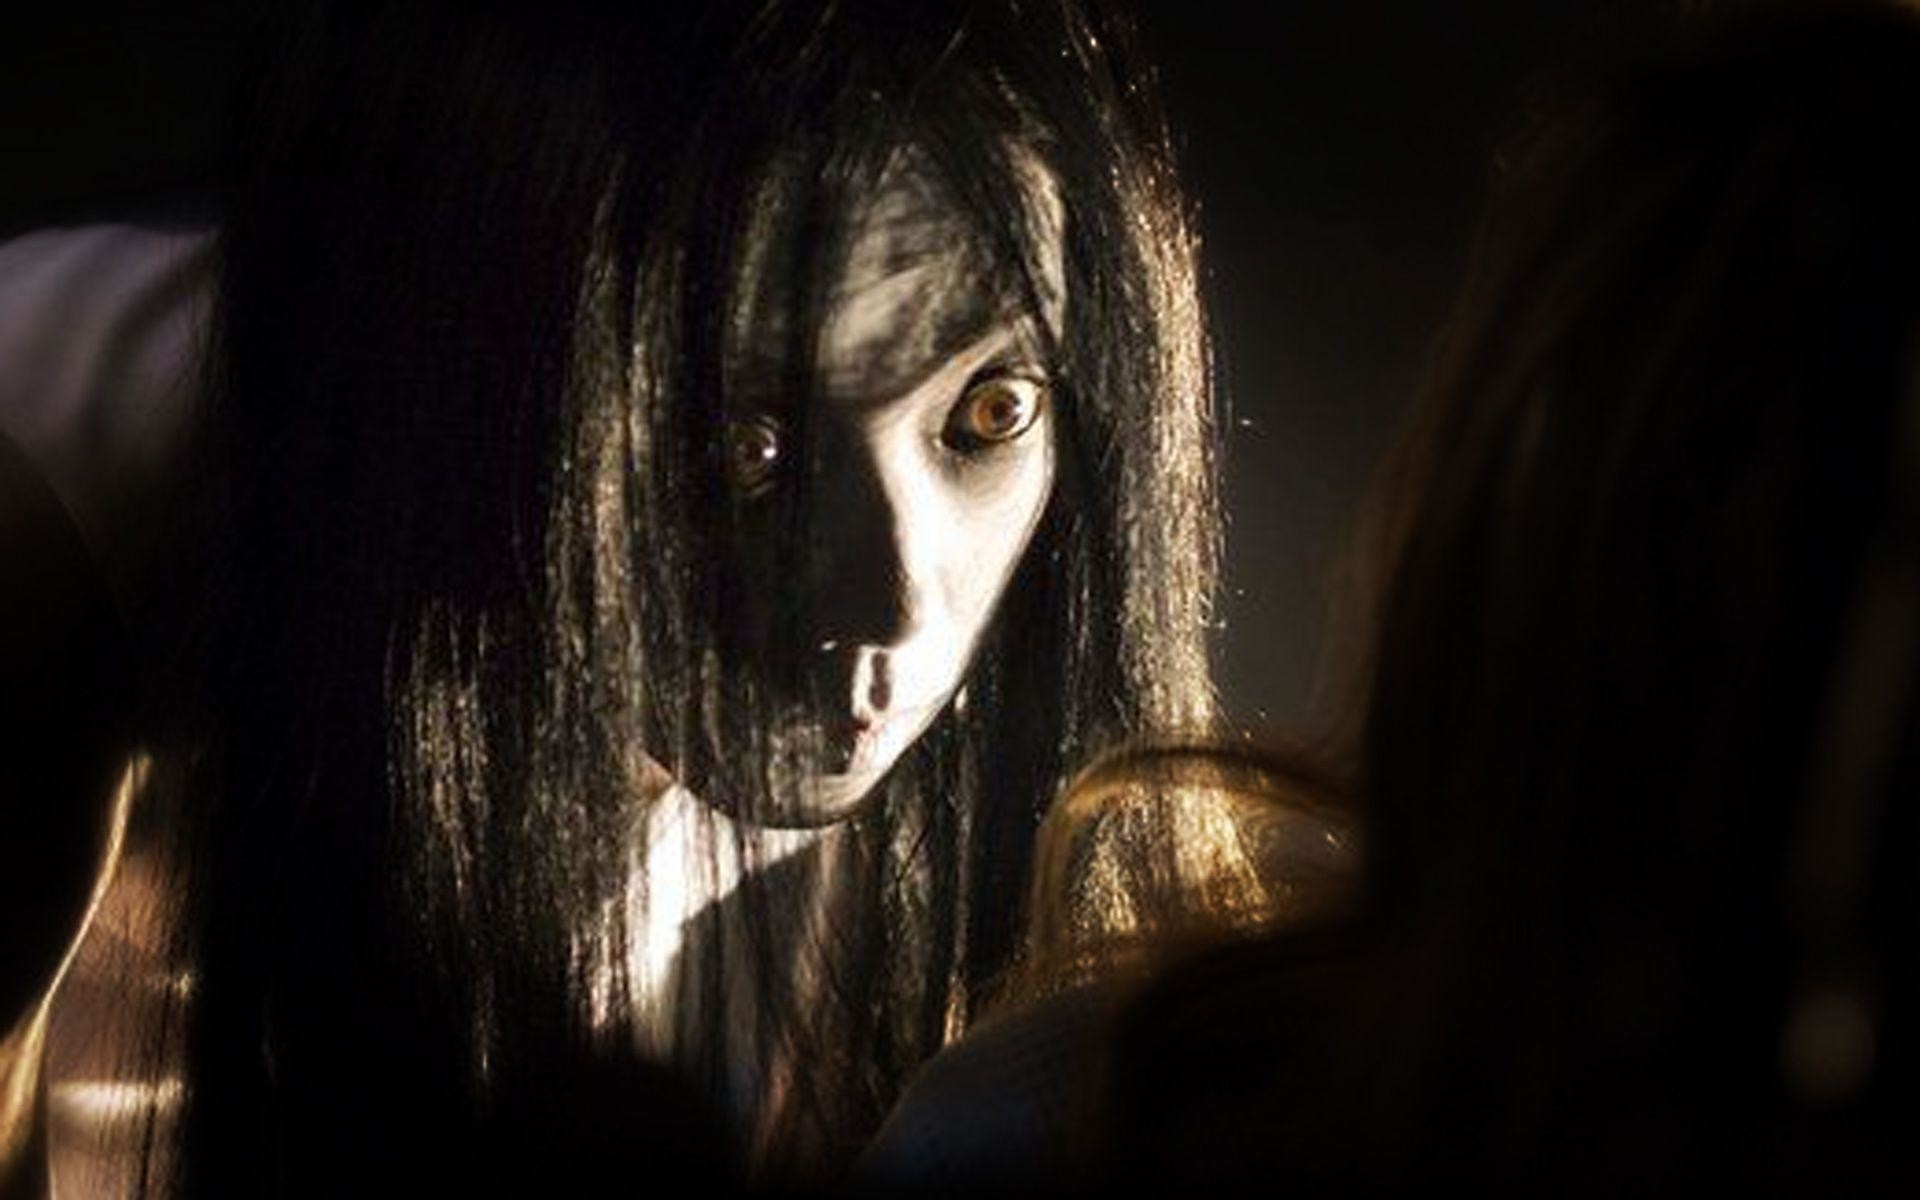 CHILDS PLAY chucky dark horror creepy scary 28 wallpaper